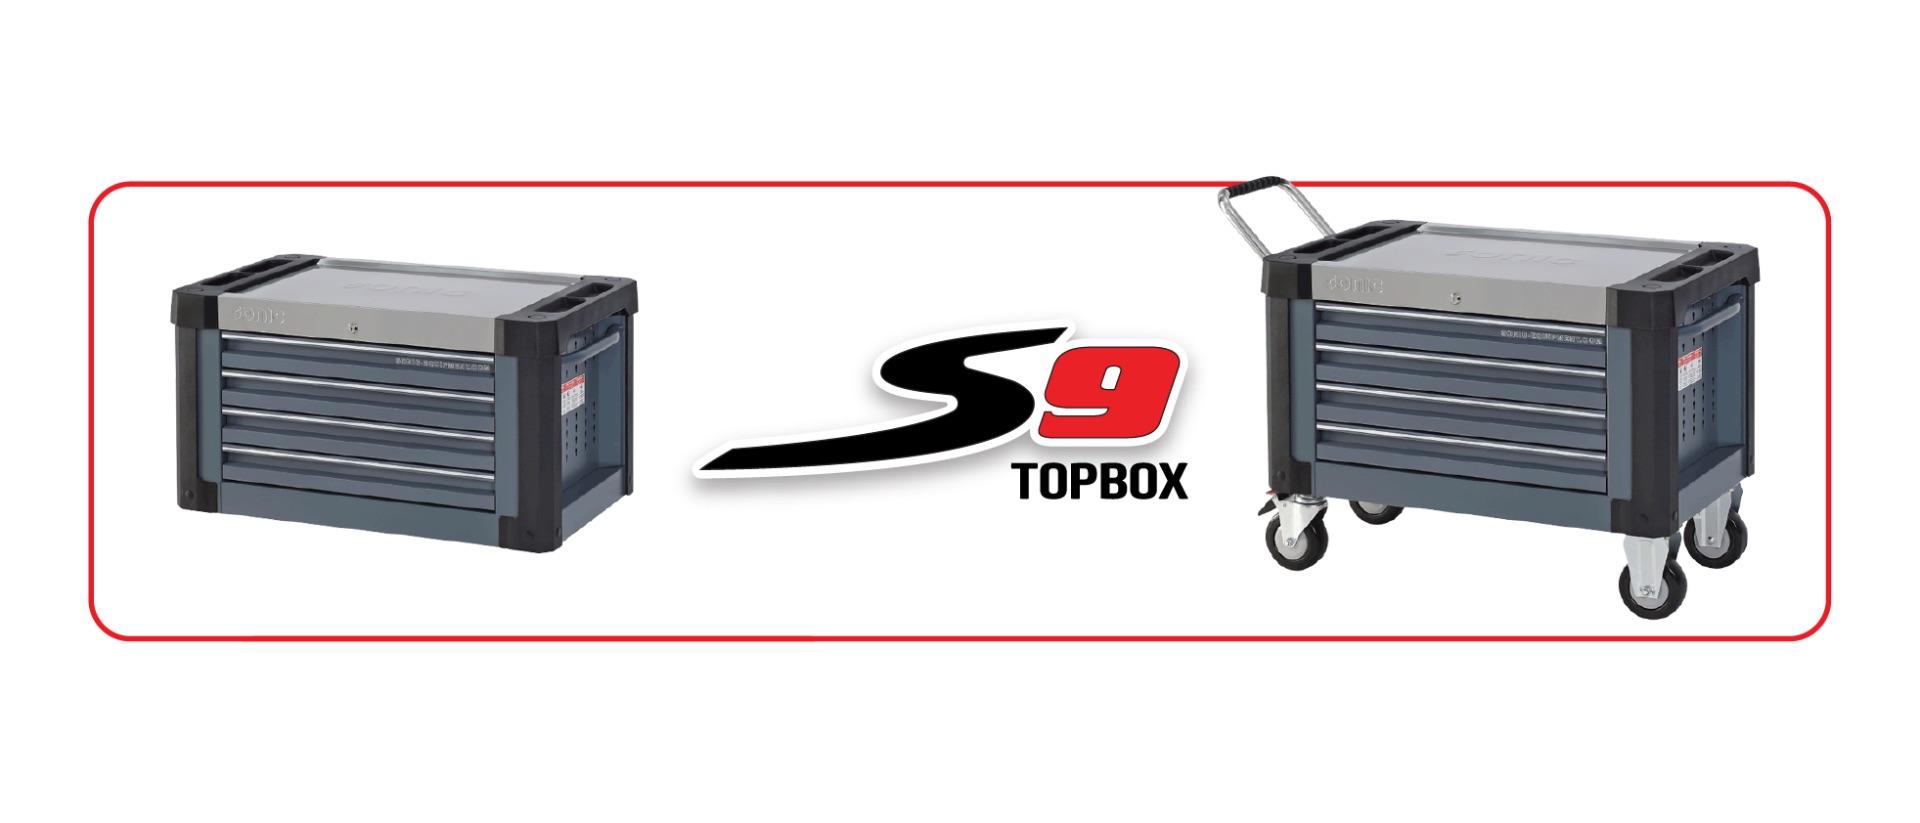 Topboxes